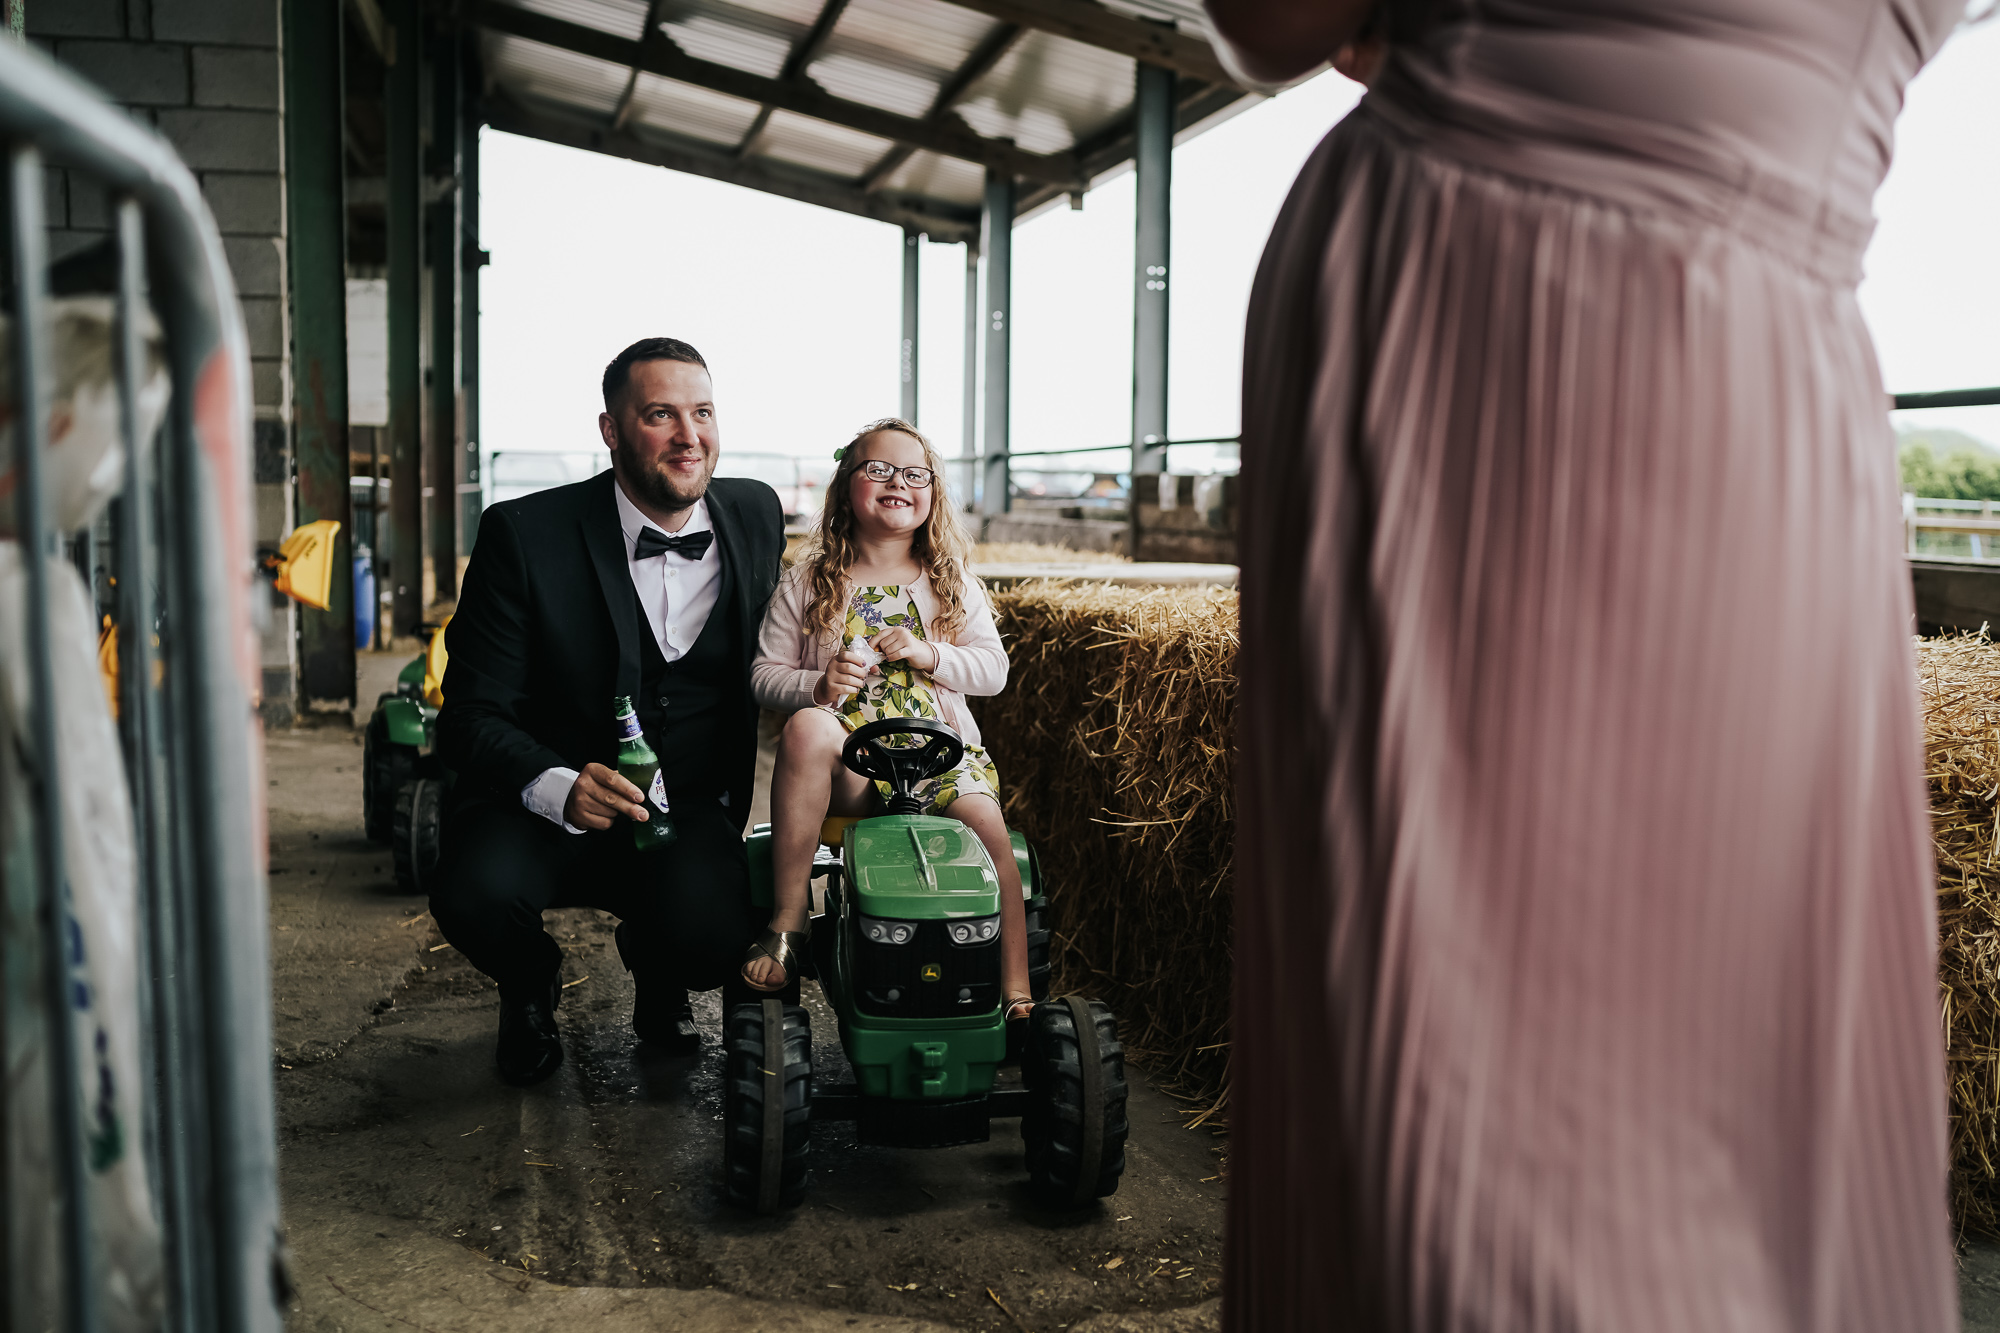 The Hayloft Wedding Photography Cheshire wedding photographer (31 of 52).jpg